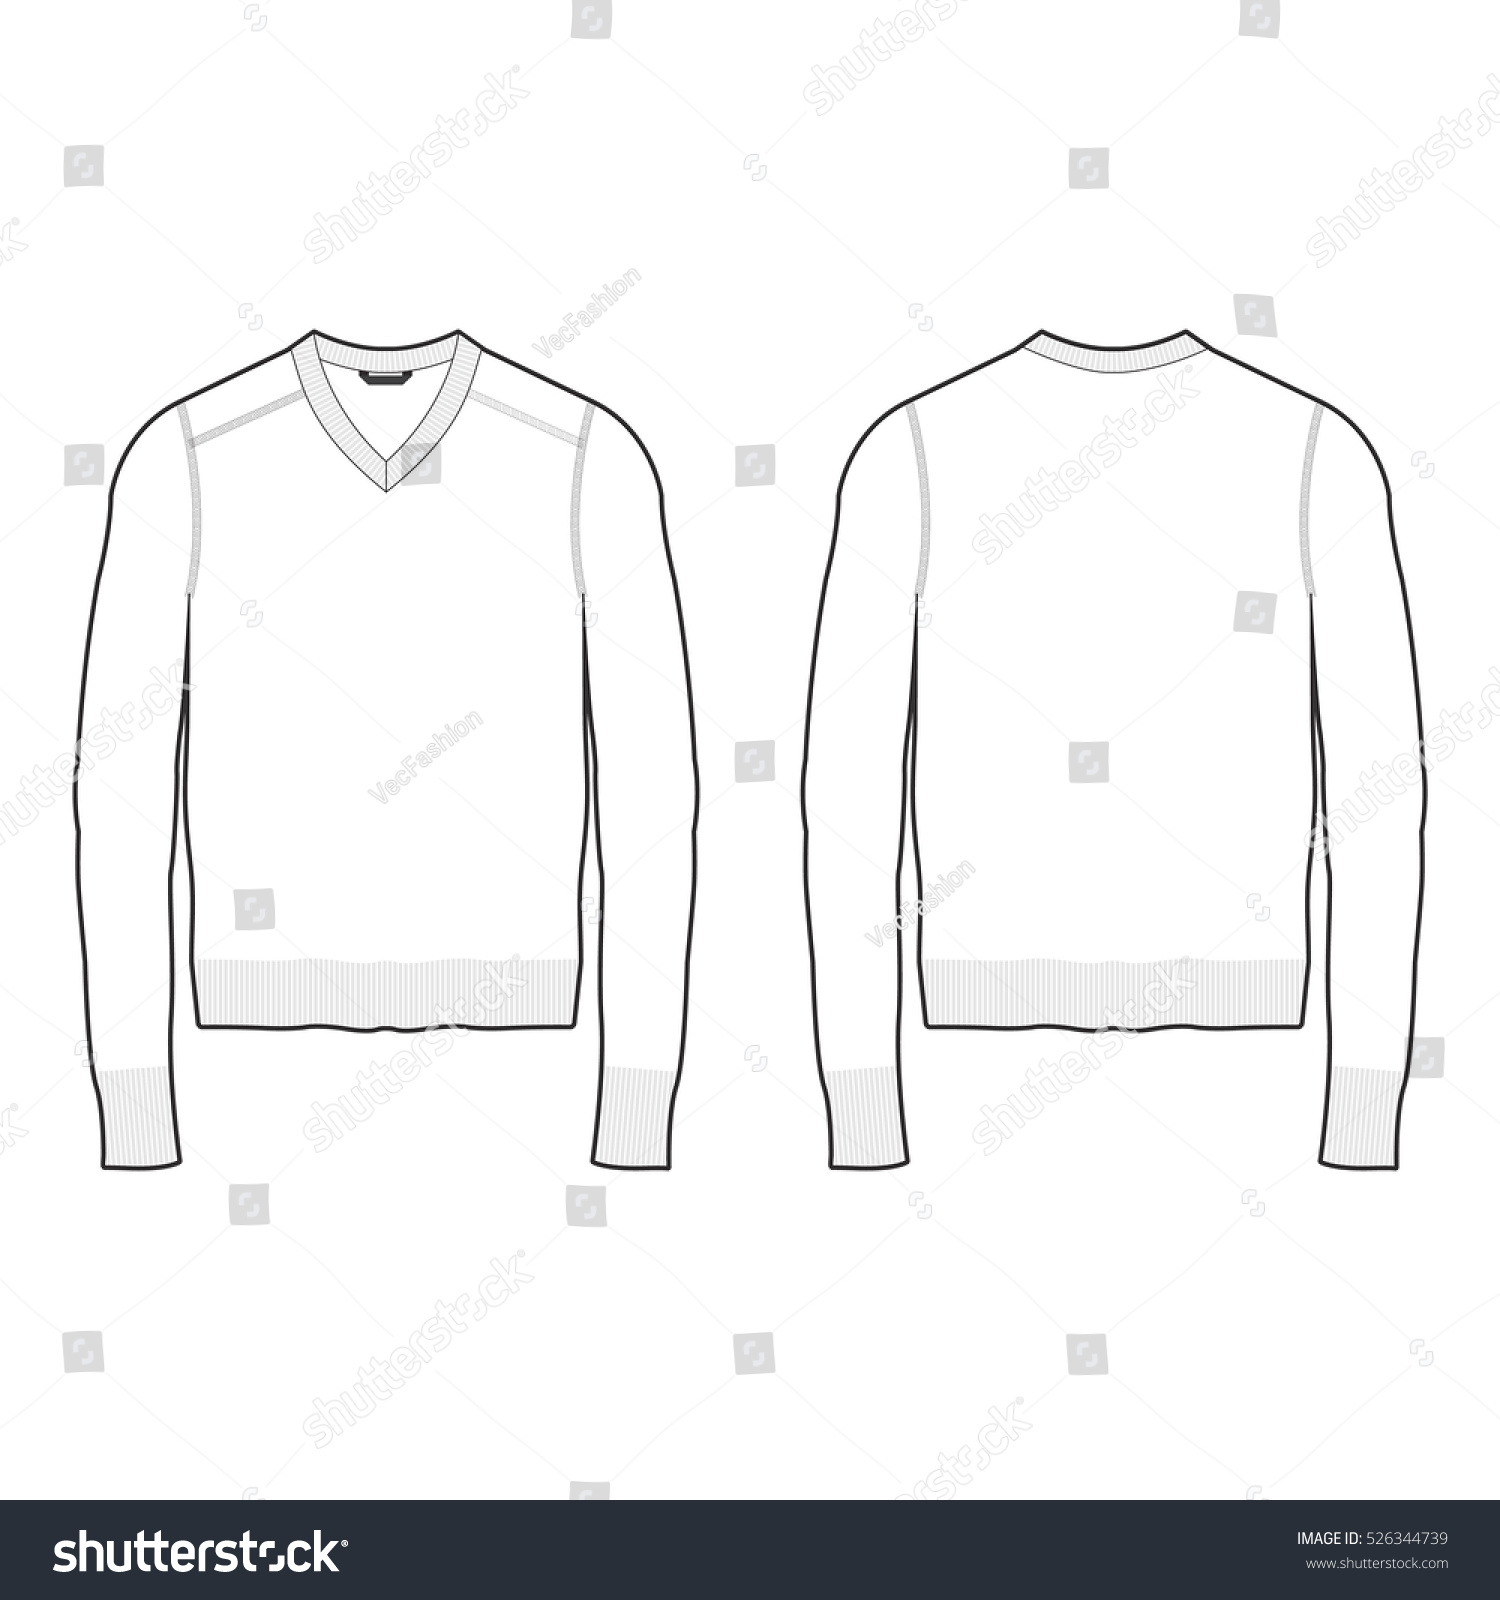 men vneck sweater template stock vector 526344739 shutterstock. Black Bedroom Furniture Sets. Home Design Ideas